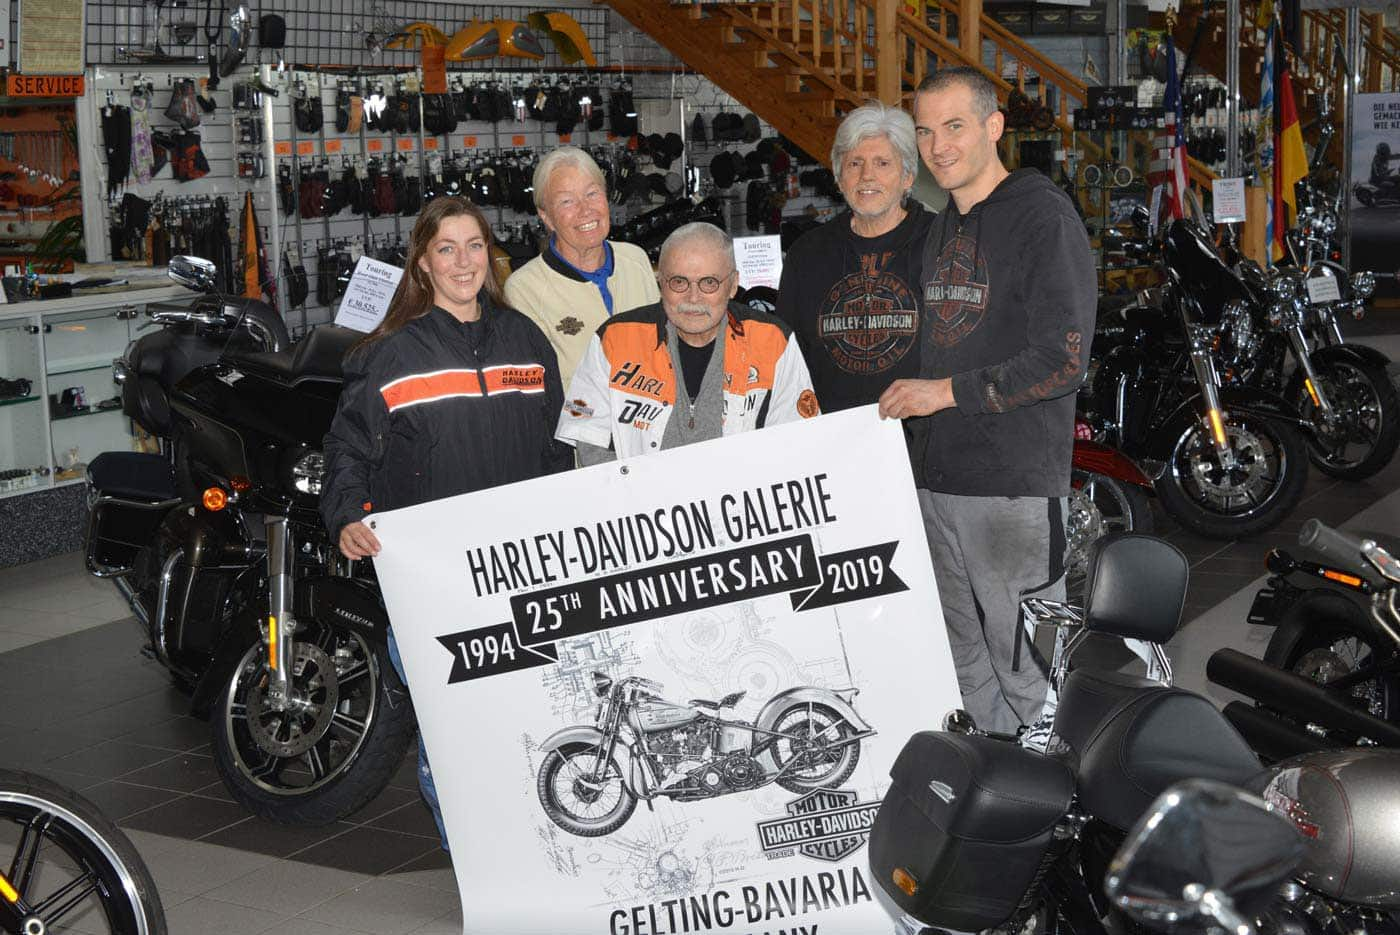 Harley-Davidson Galerie in Gelting